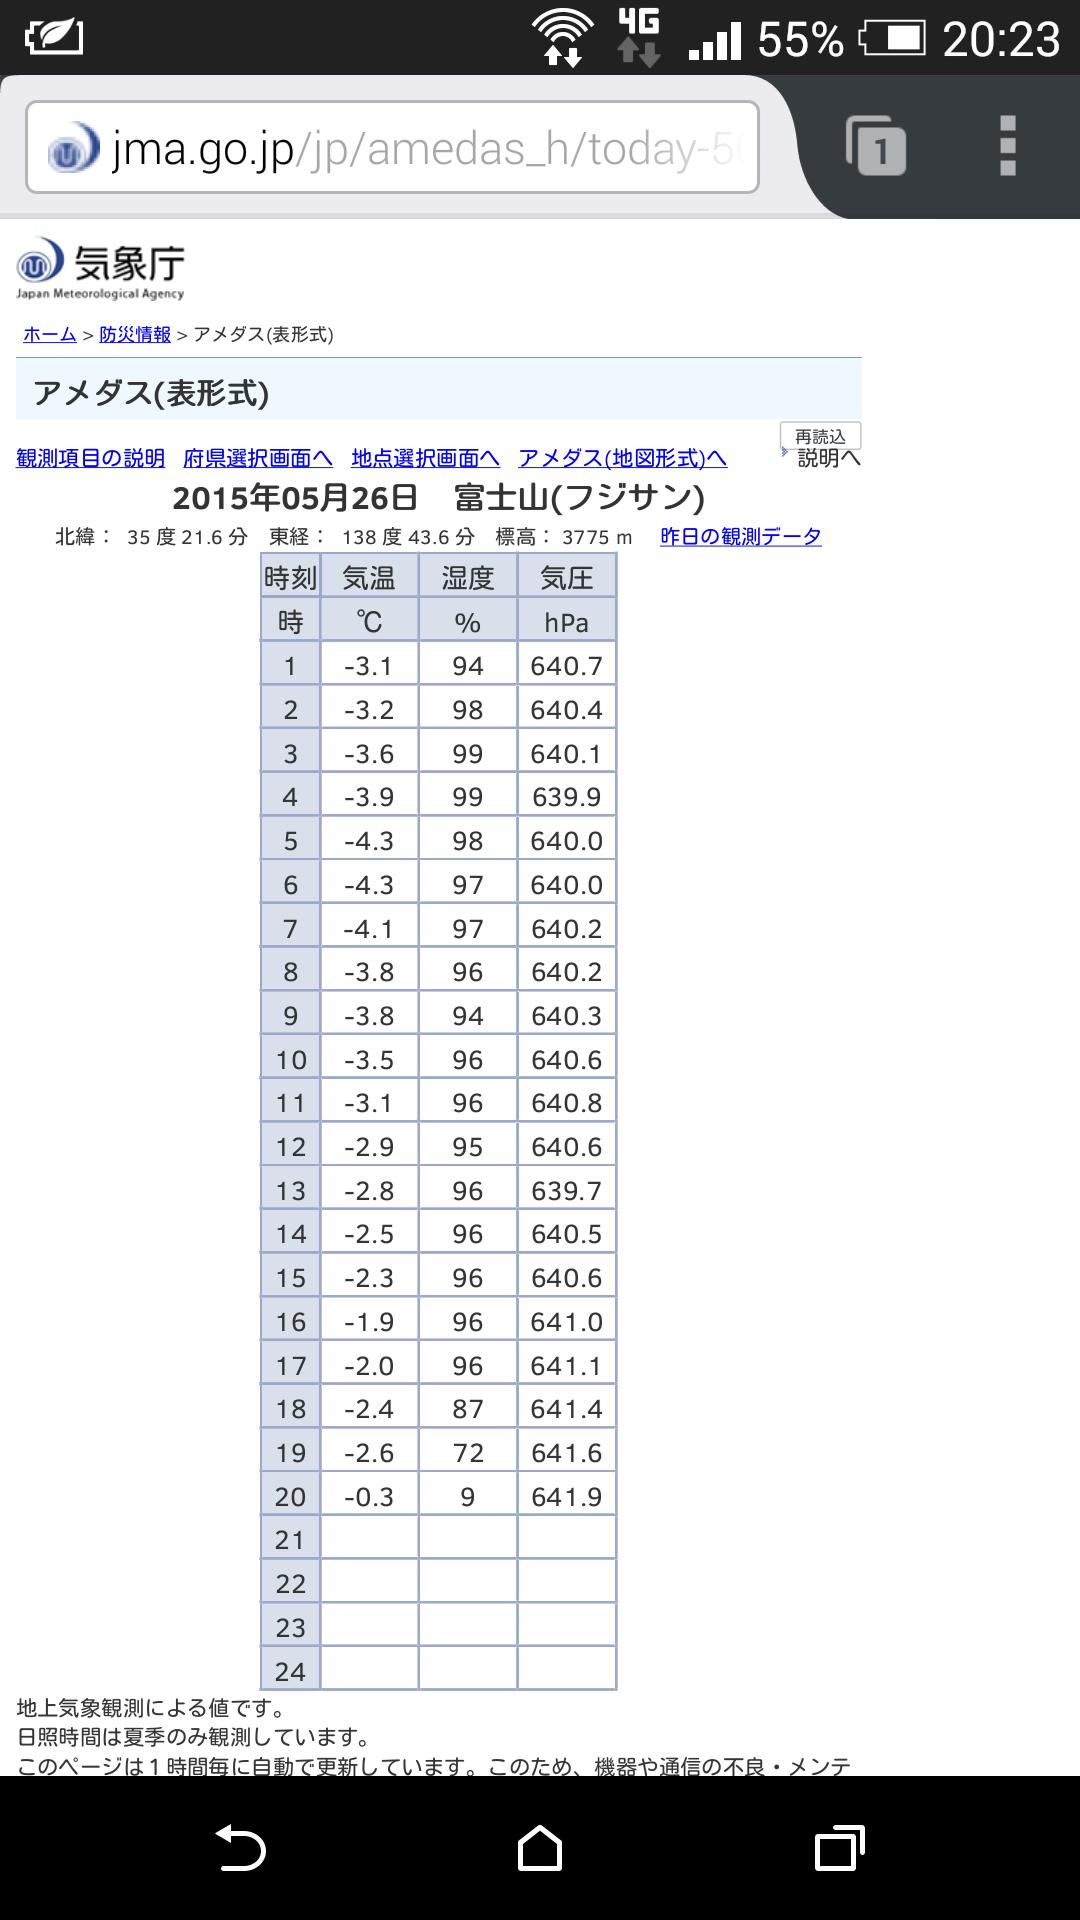 Screenshot_2015-05-26-20-23-56.png